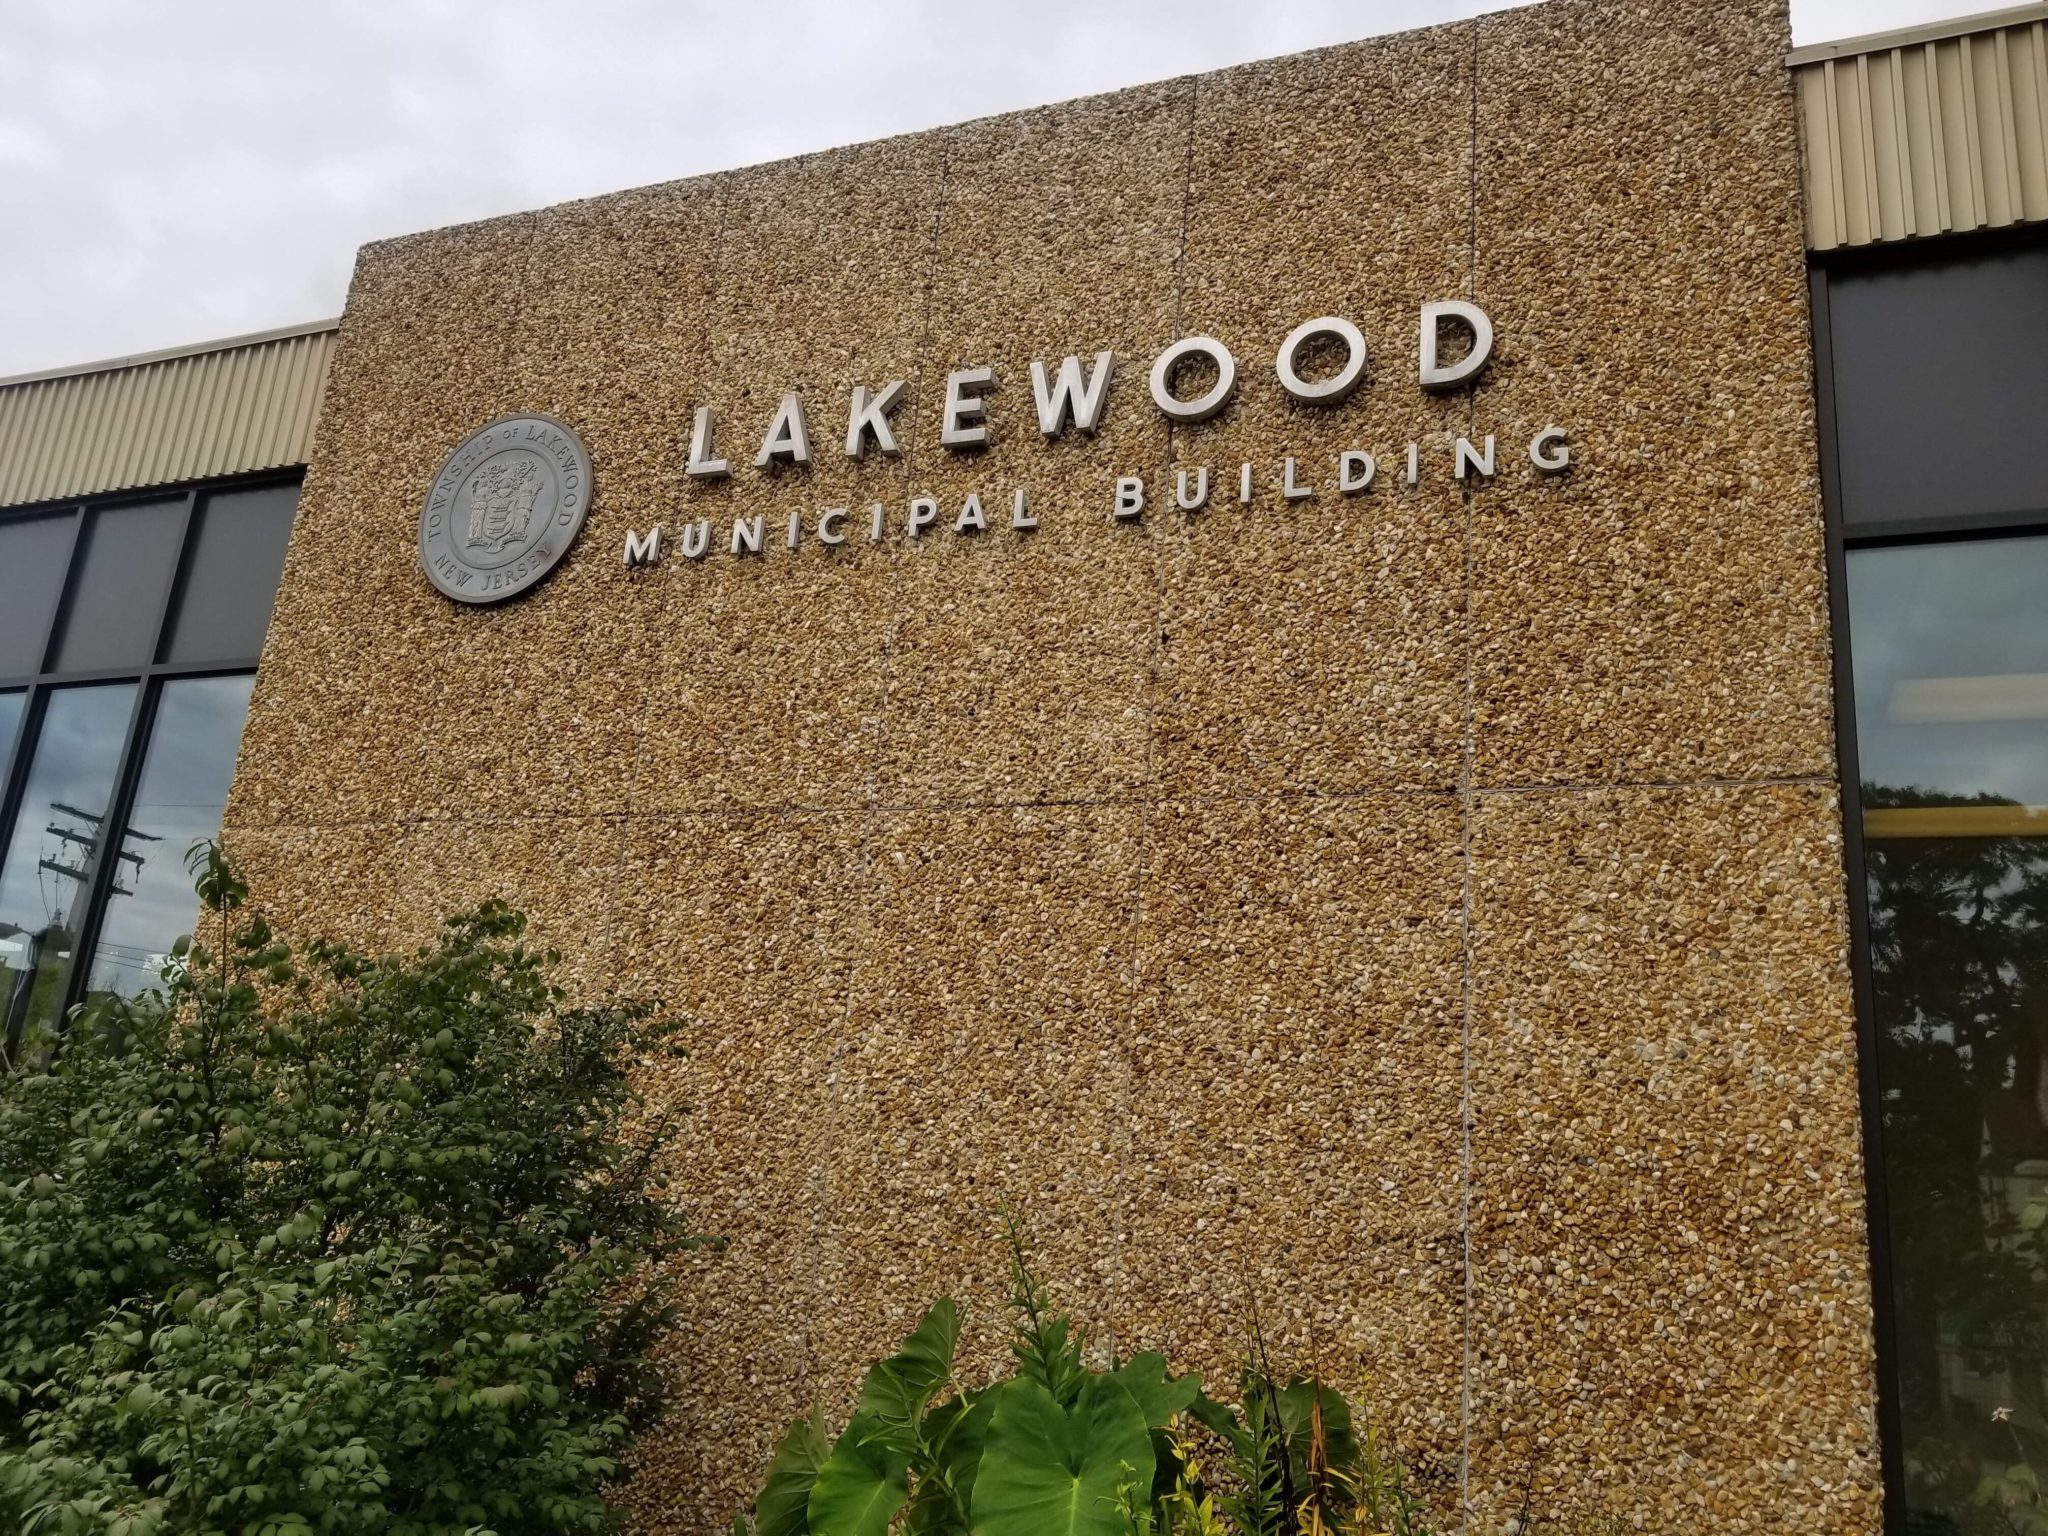 Lakewood: Good Morning ICE Warrants